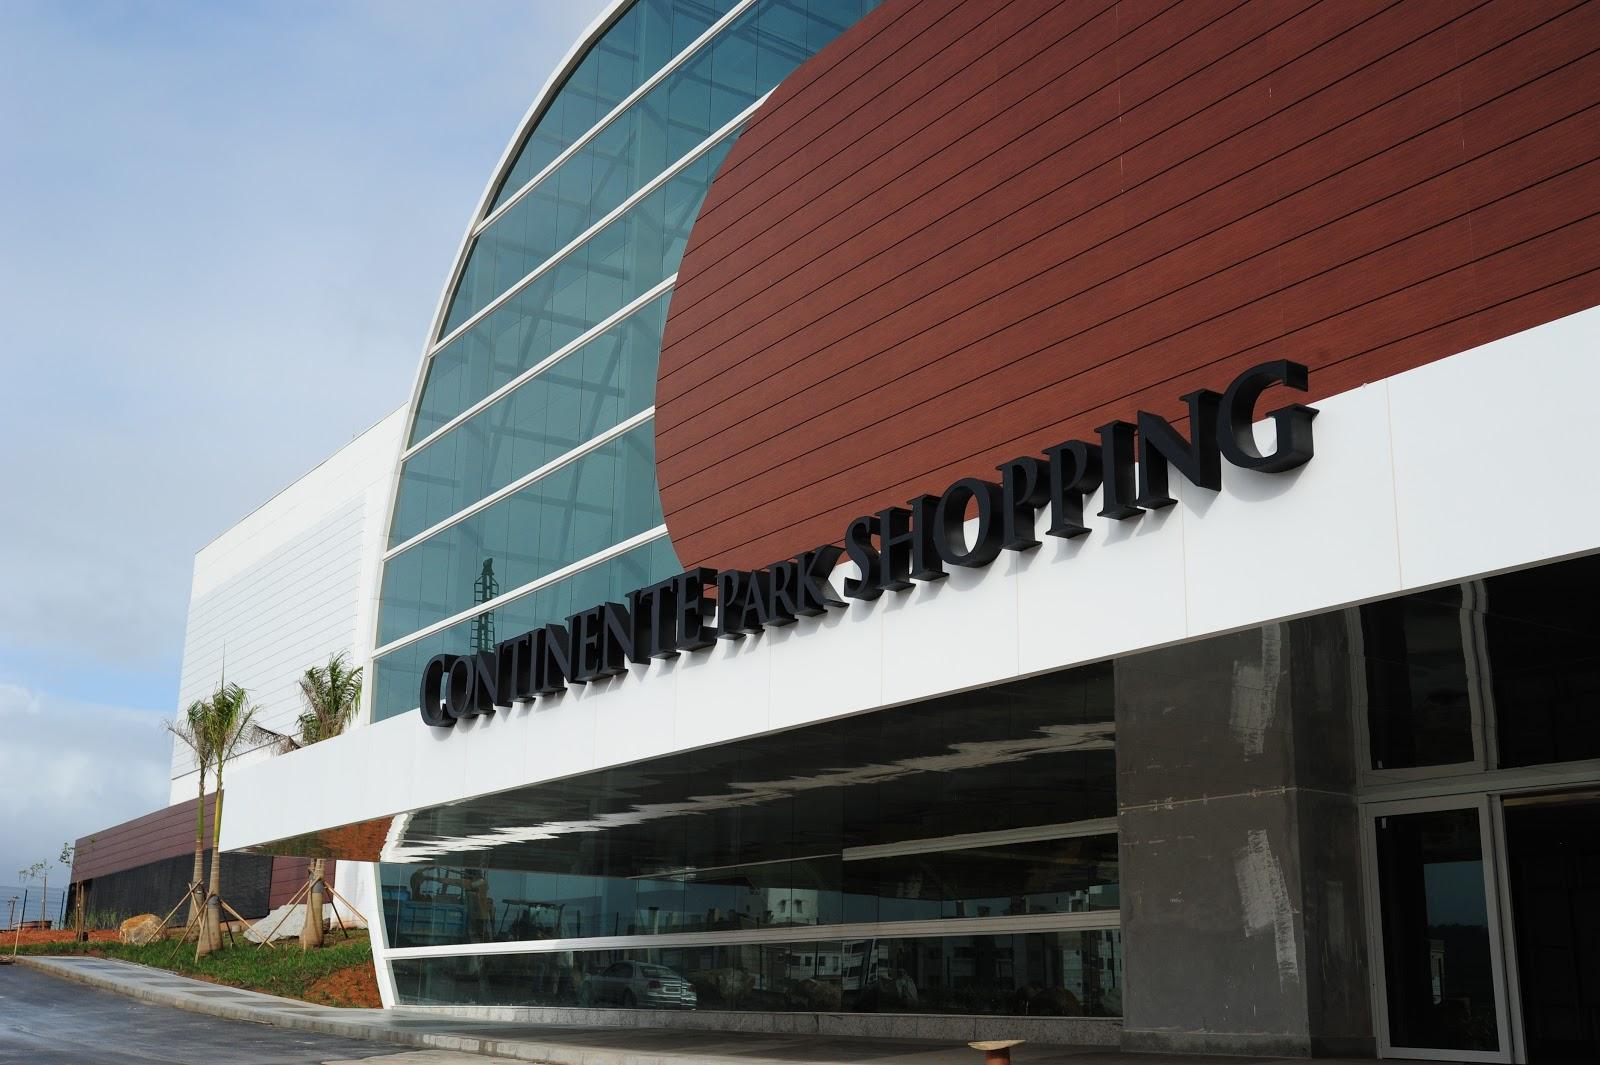 SC) Sao Jose Continente Park Shopping 44 mil m? ABL #3B6390 1600 1065